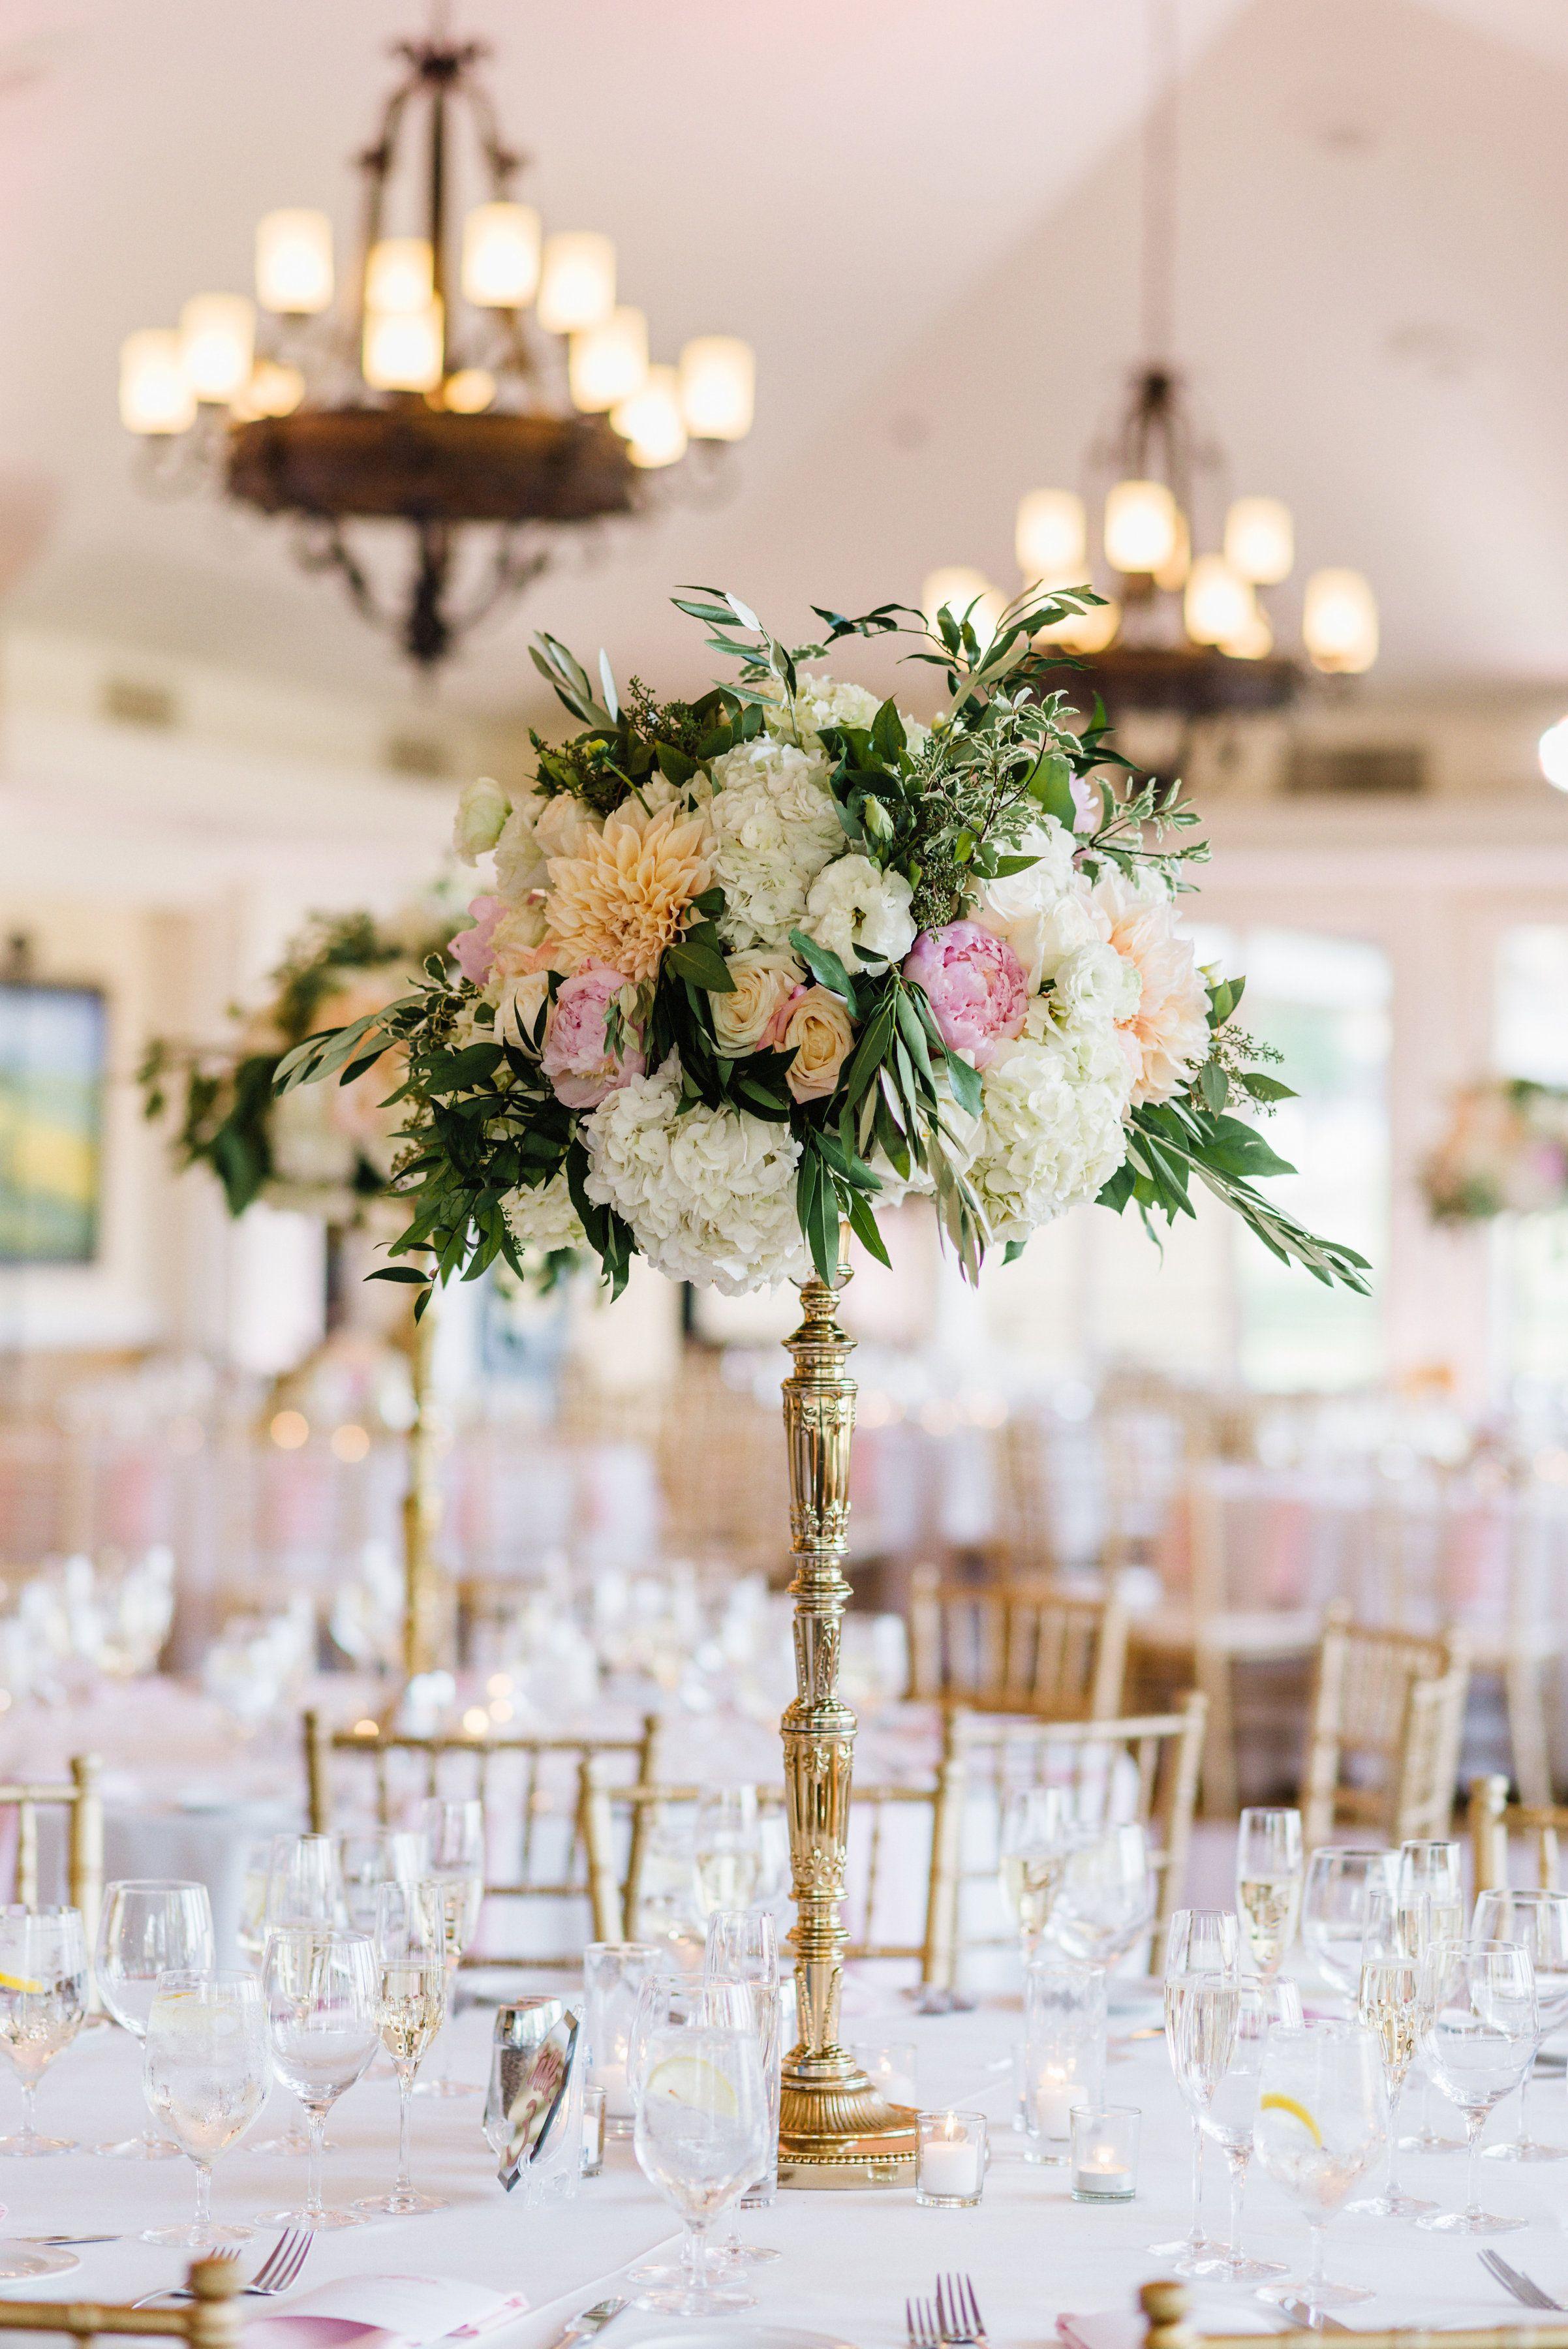 Tall Blush And Gold Centerpiece Dahlias Hydrangea Peonies Greenery Roses Bella Collina